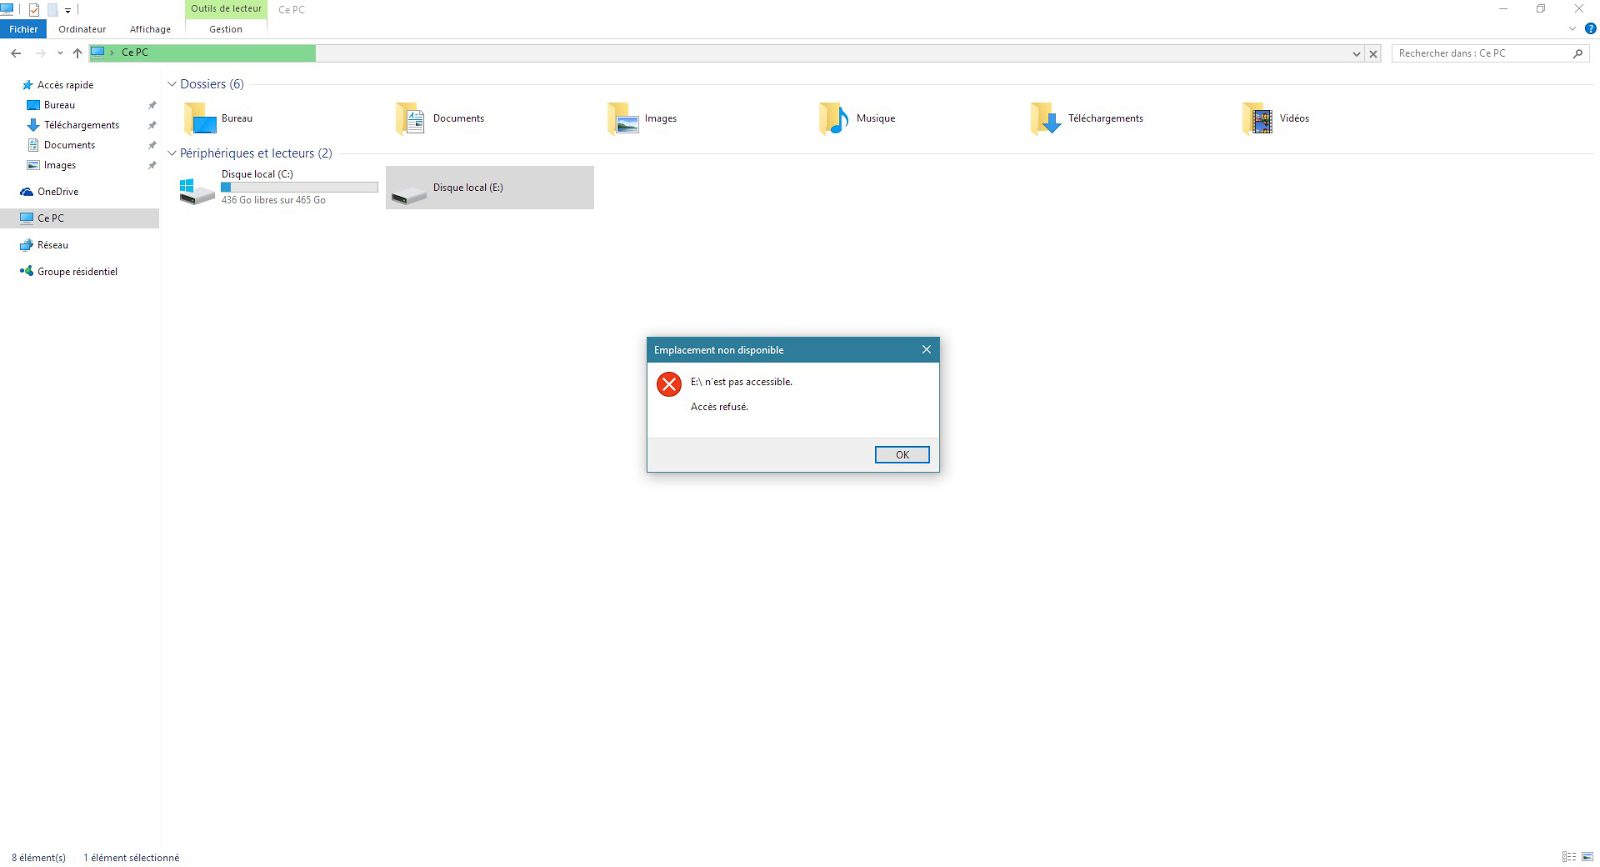 erreur 5 accès refusé lors de l'installation du logiciel